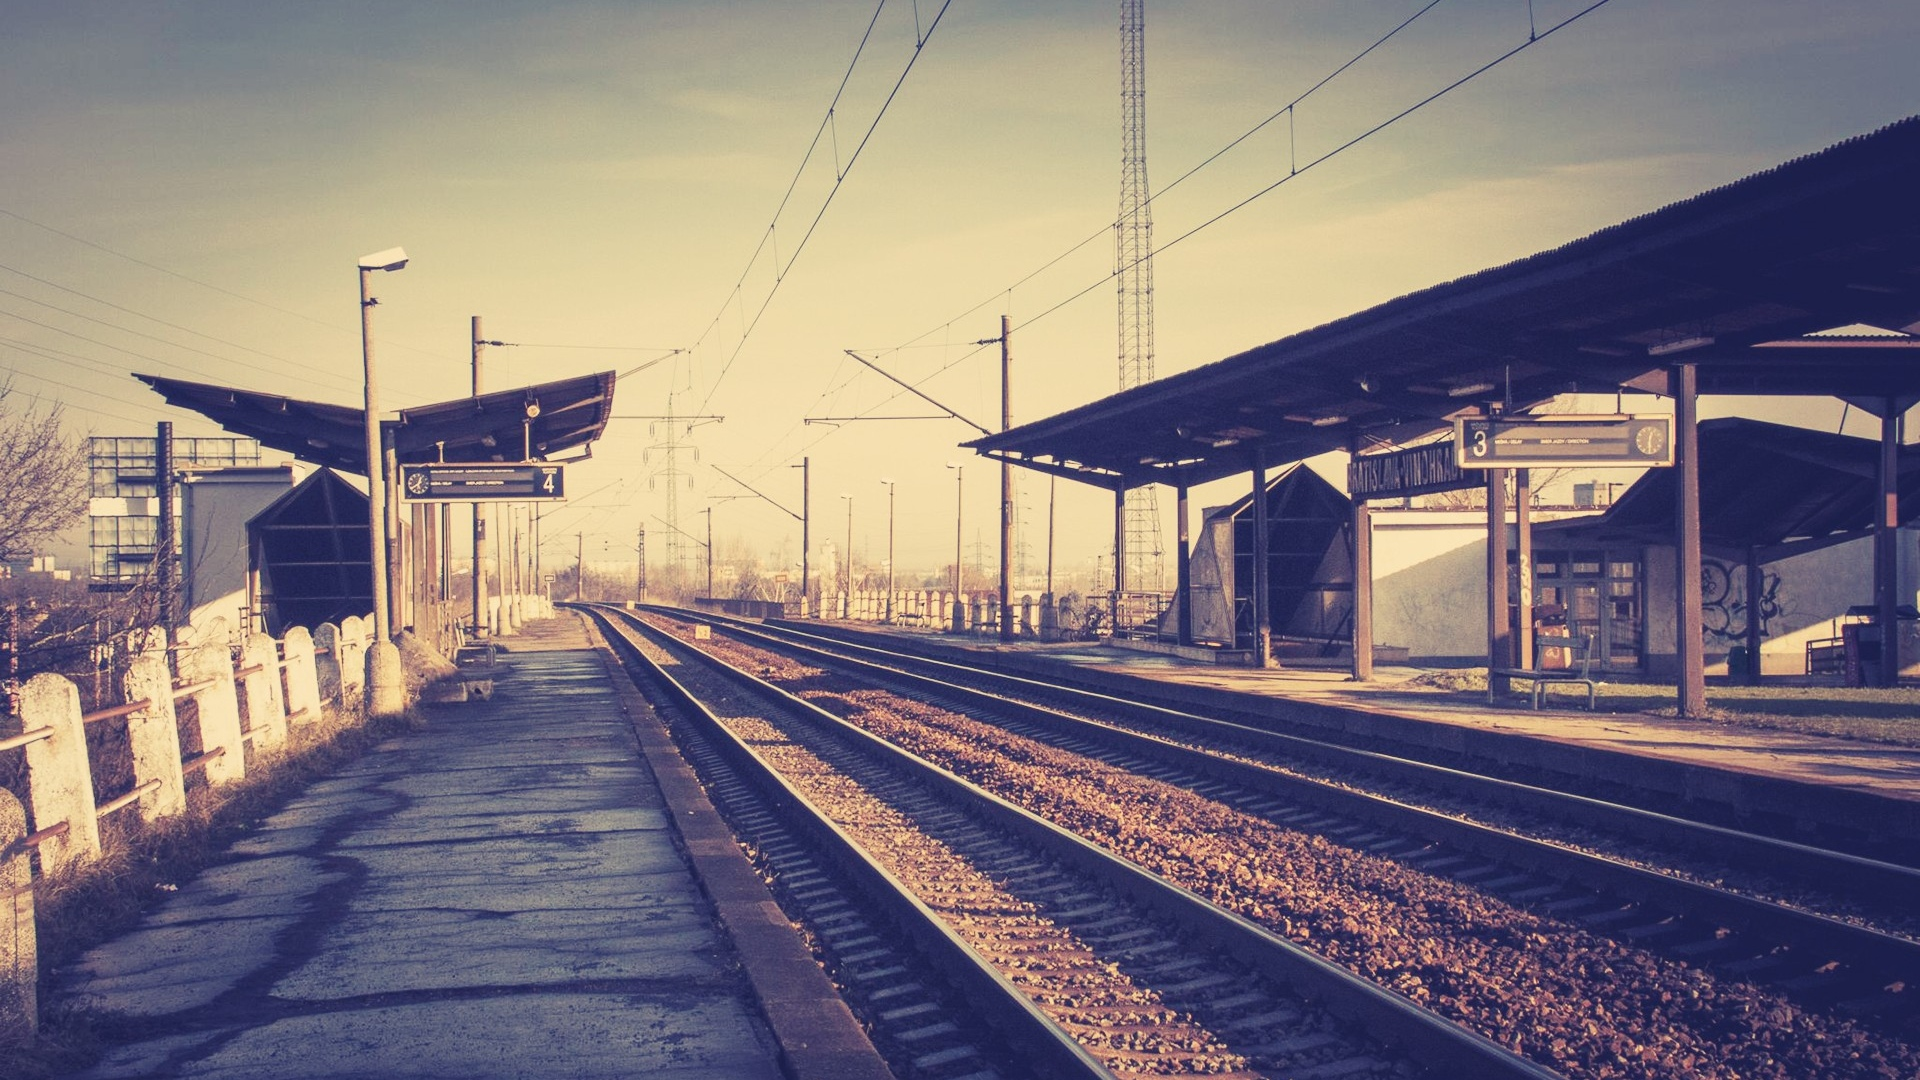 train station desktop wallpaper 49175